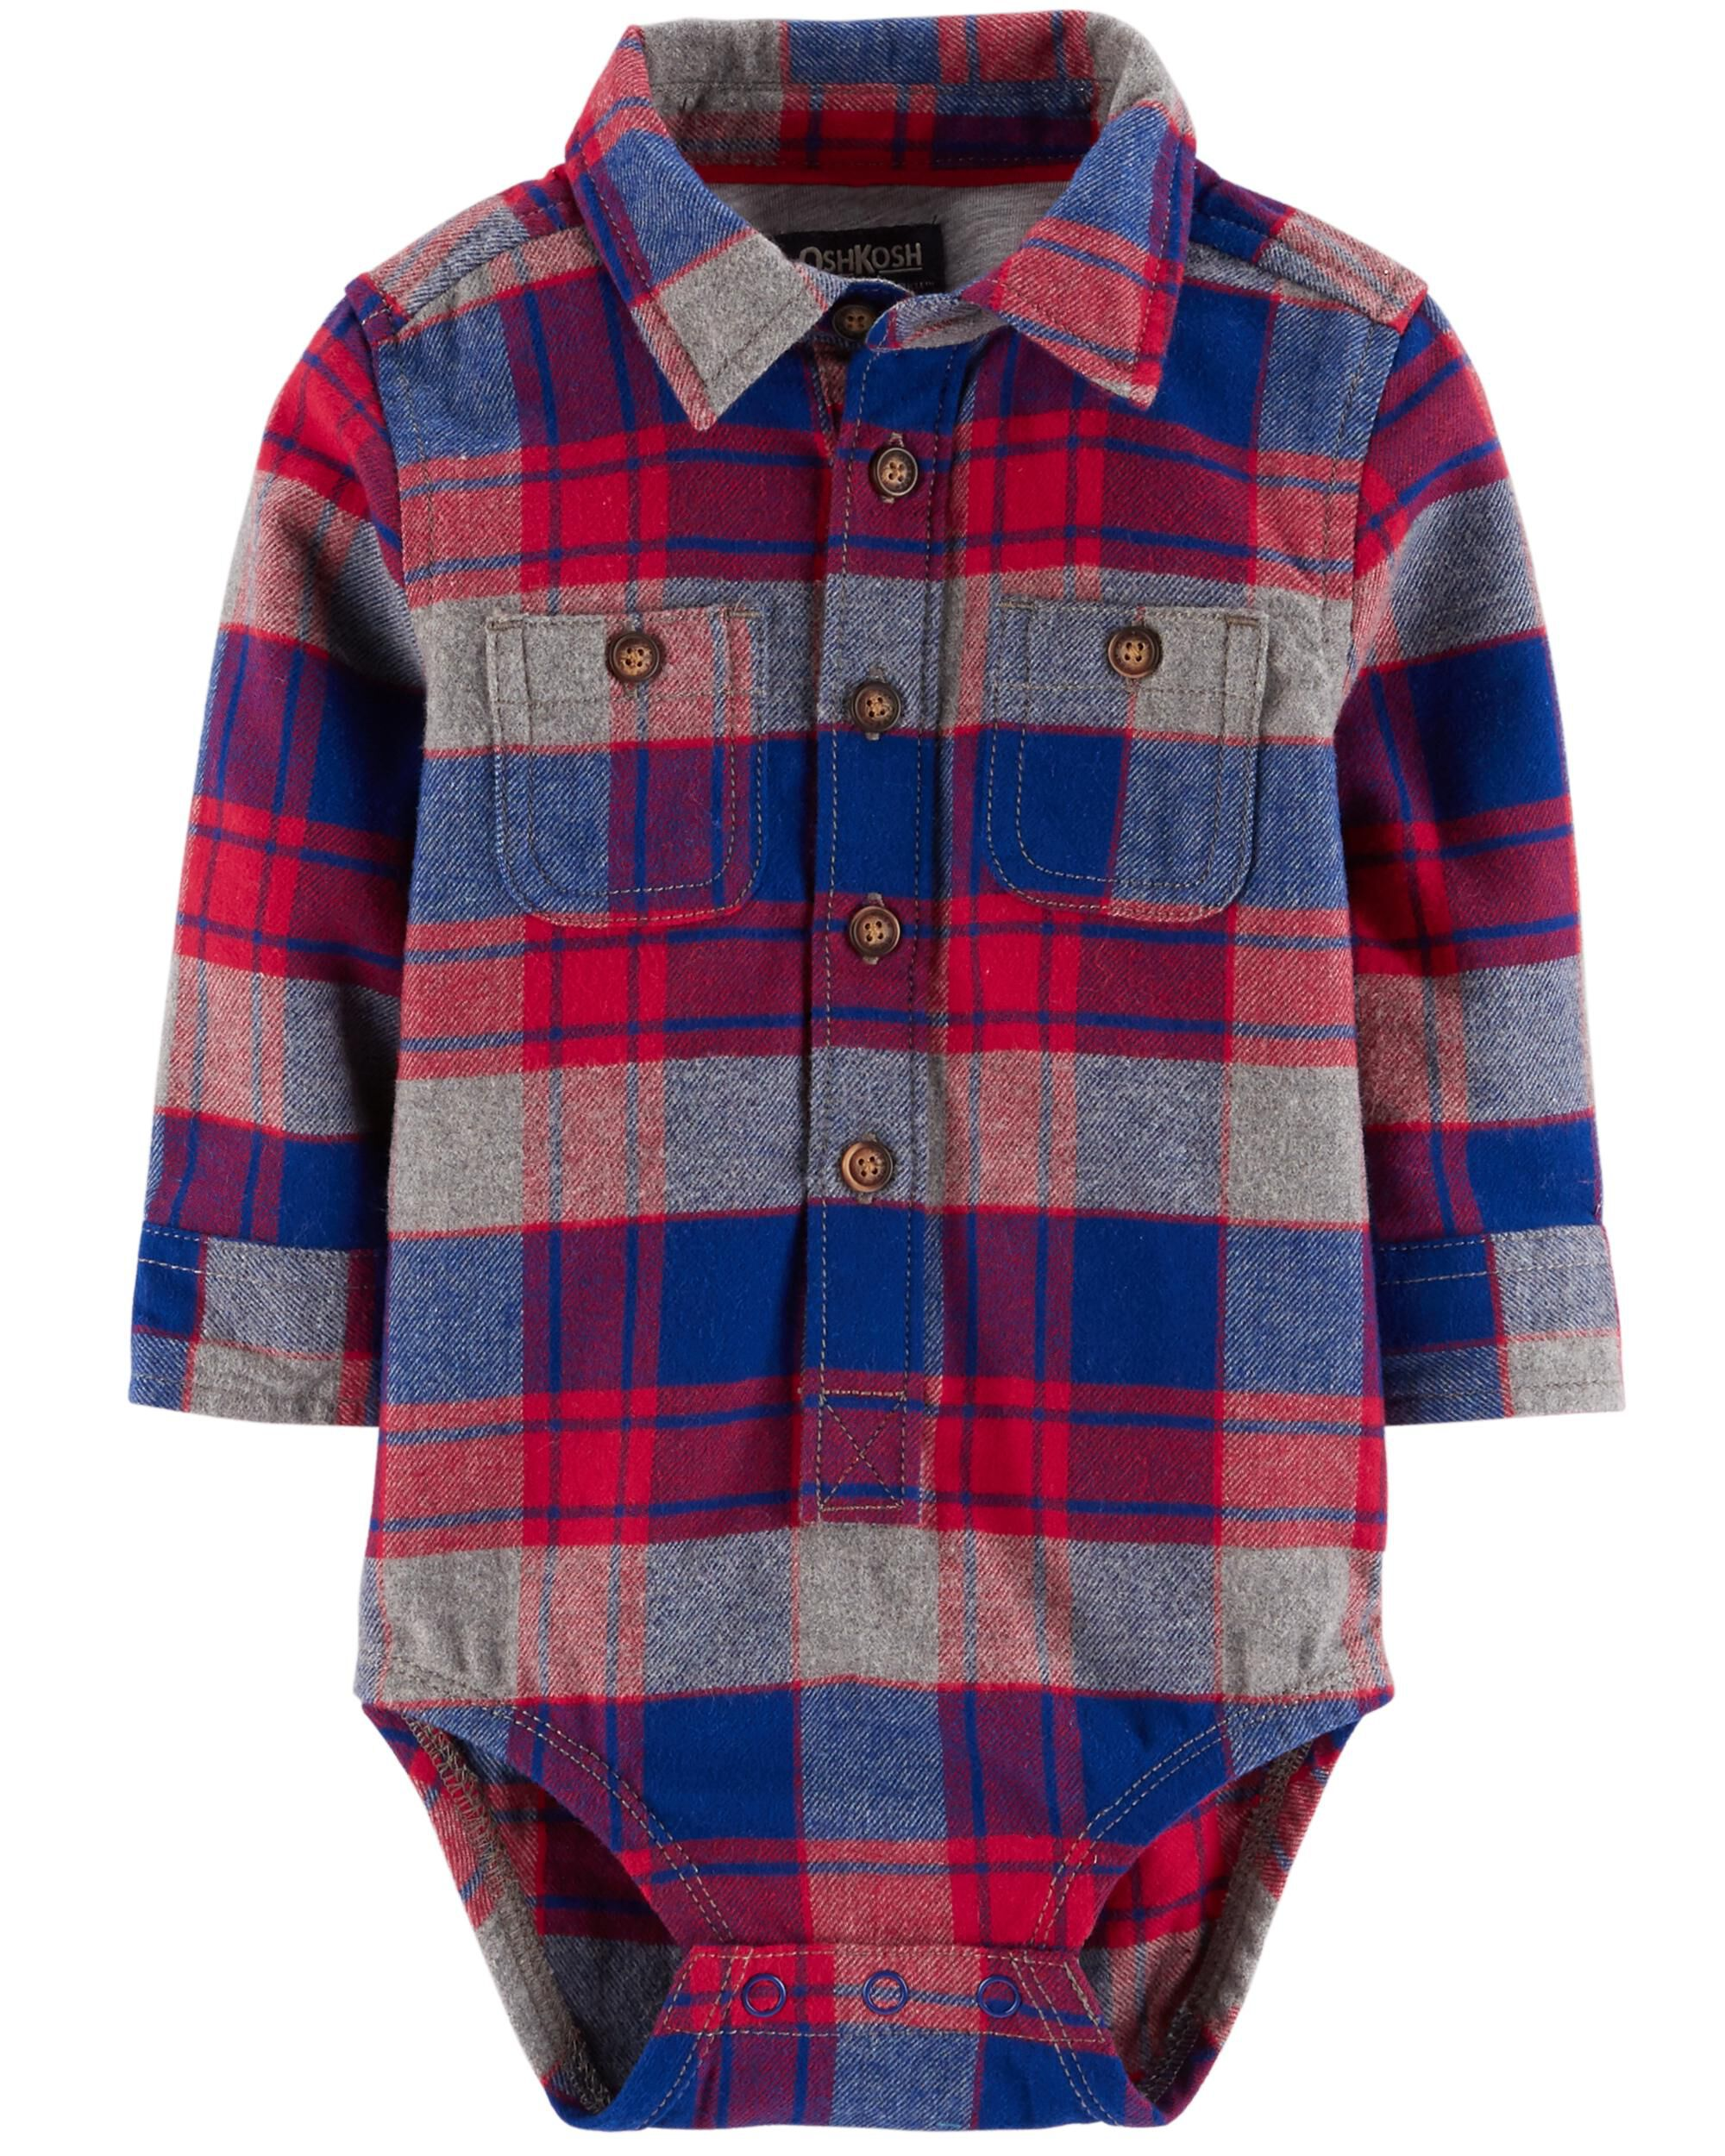 Oshkosh B/'gosh 6 9 12 Months 4T 5T Checkered Shortalls Baby Toddler Boy Clothes